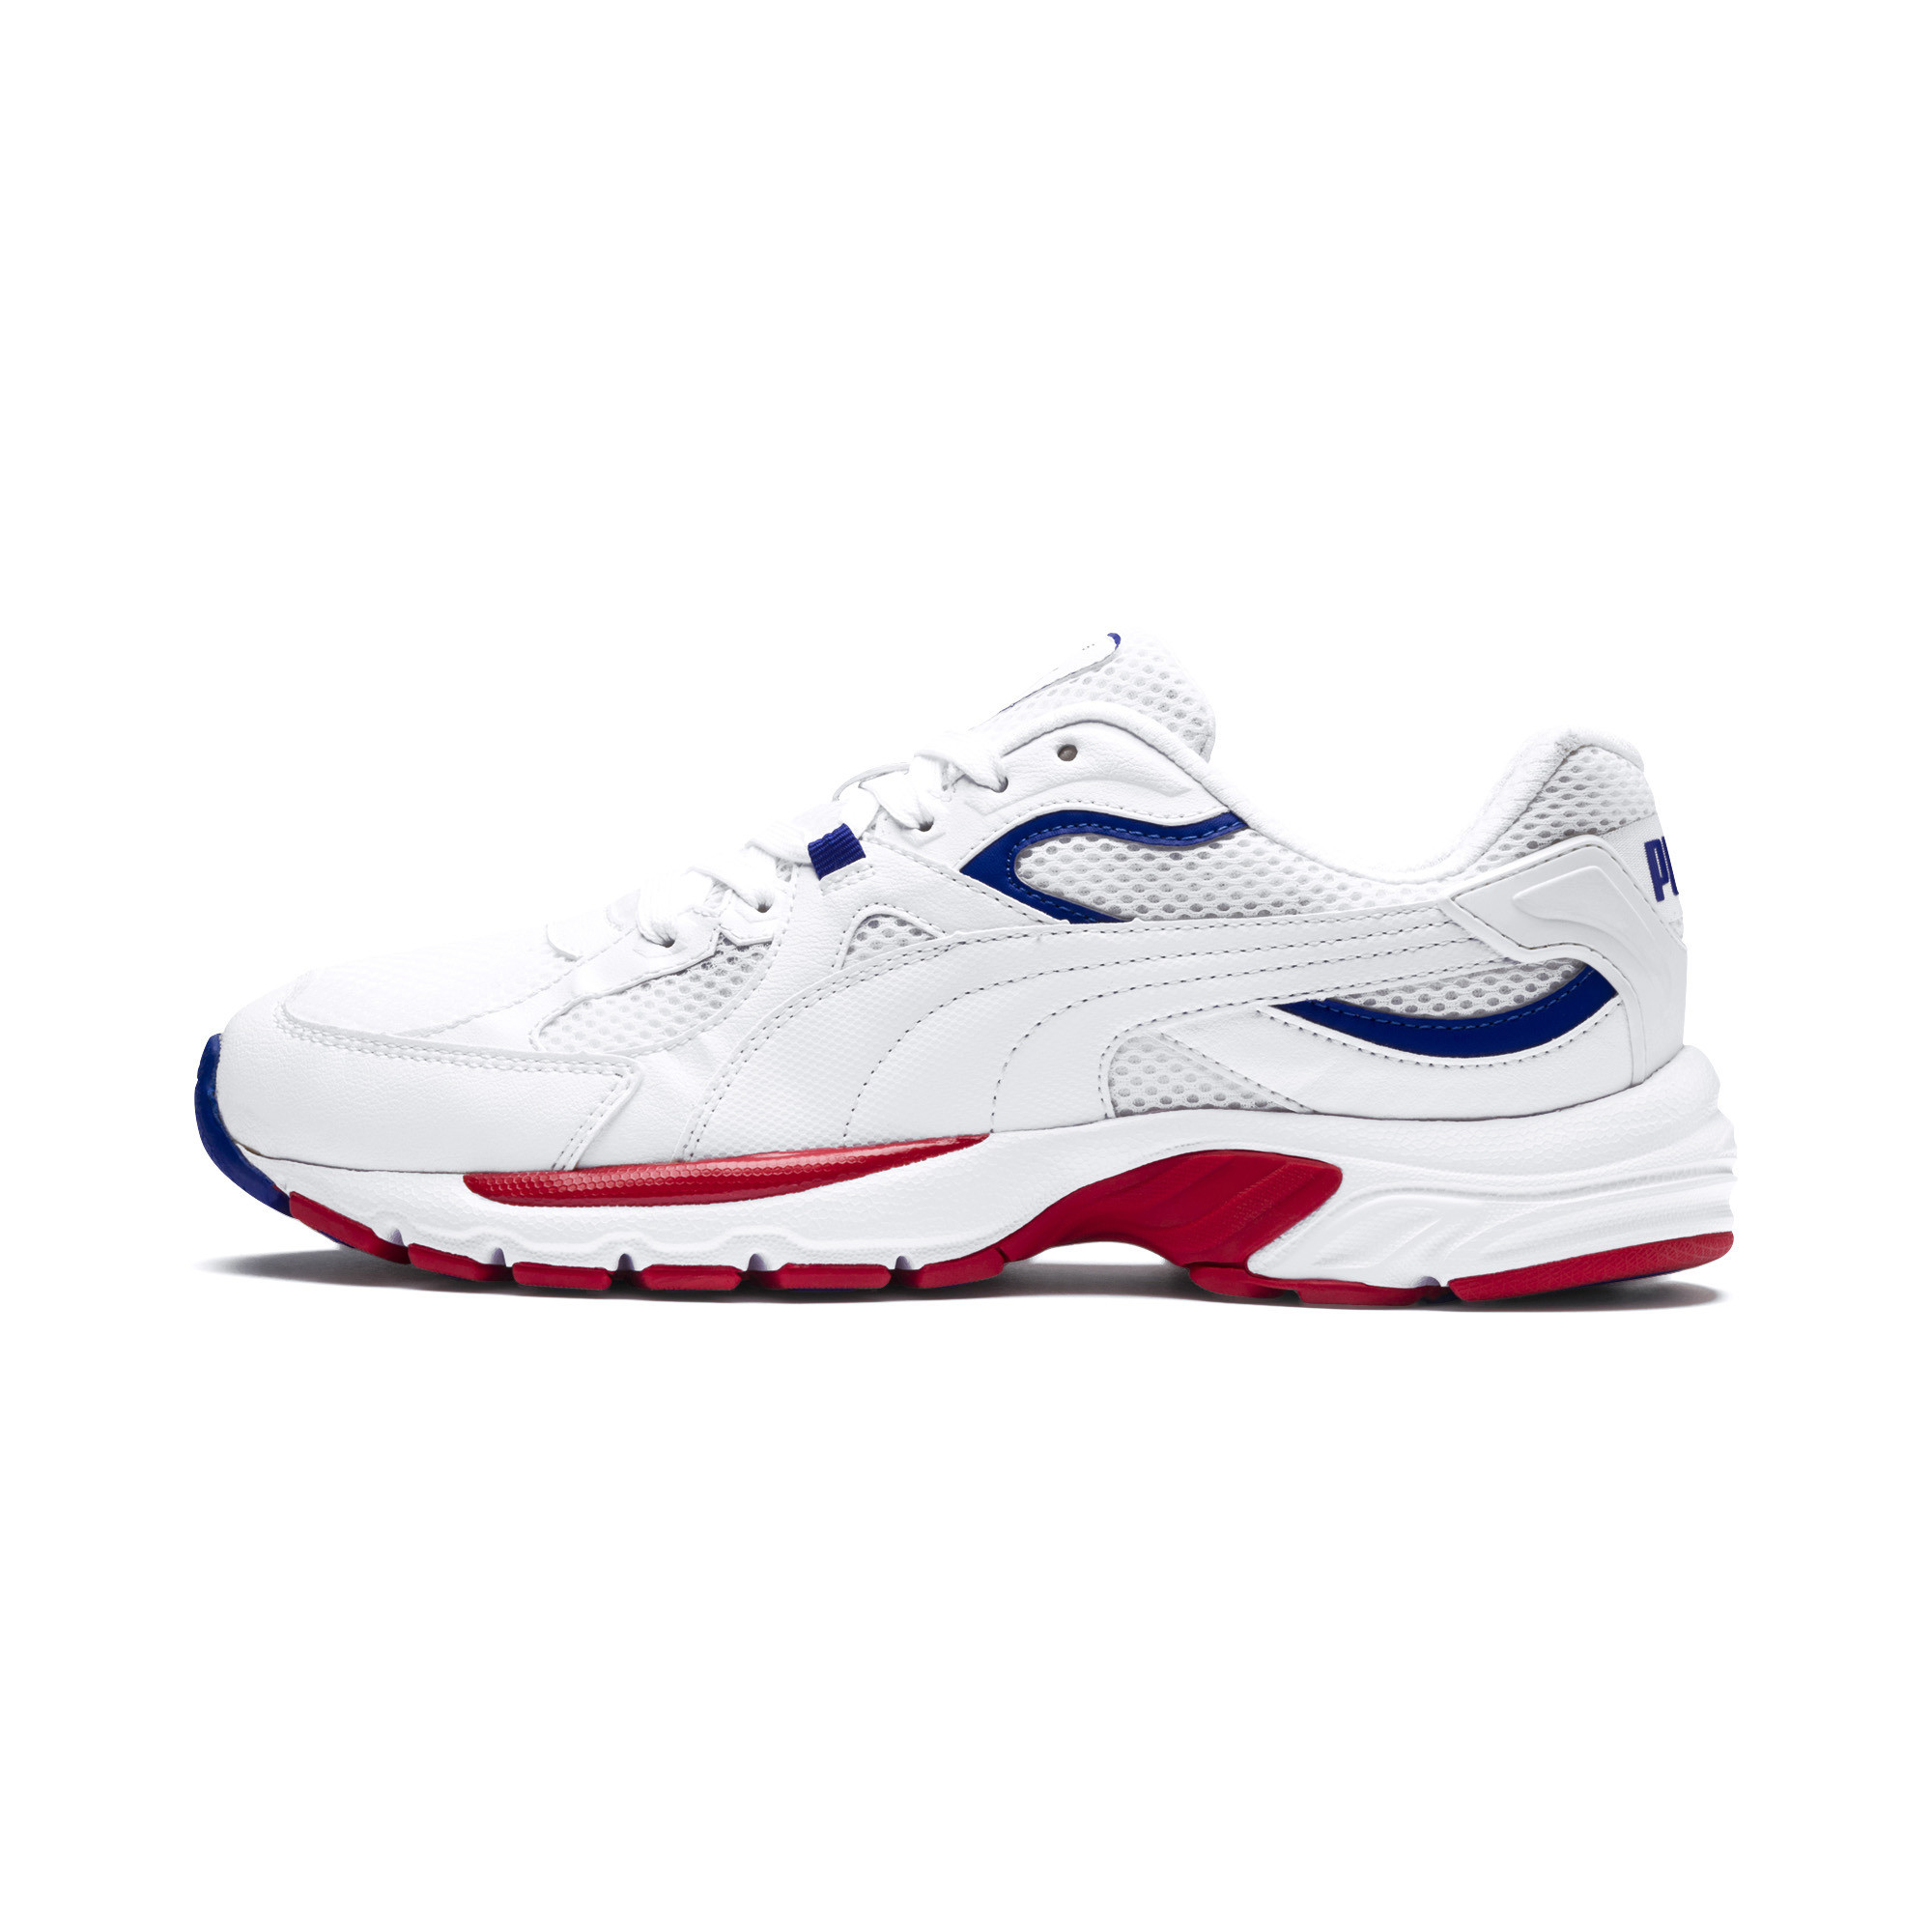 PUMA-Axis-Plus-90s-Sneakers-Men-Shoe-Basics thumbnail 8